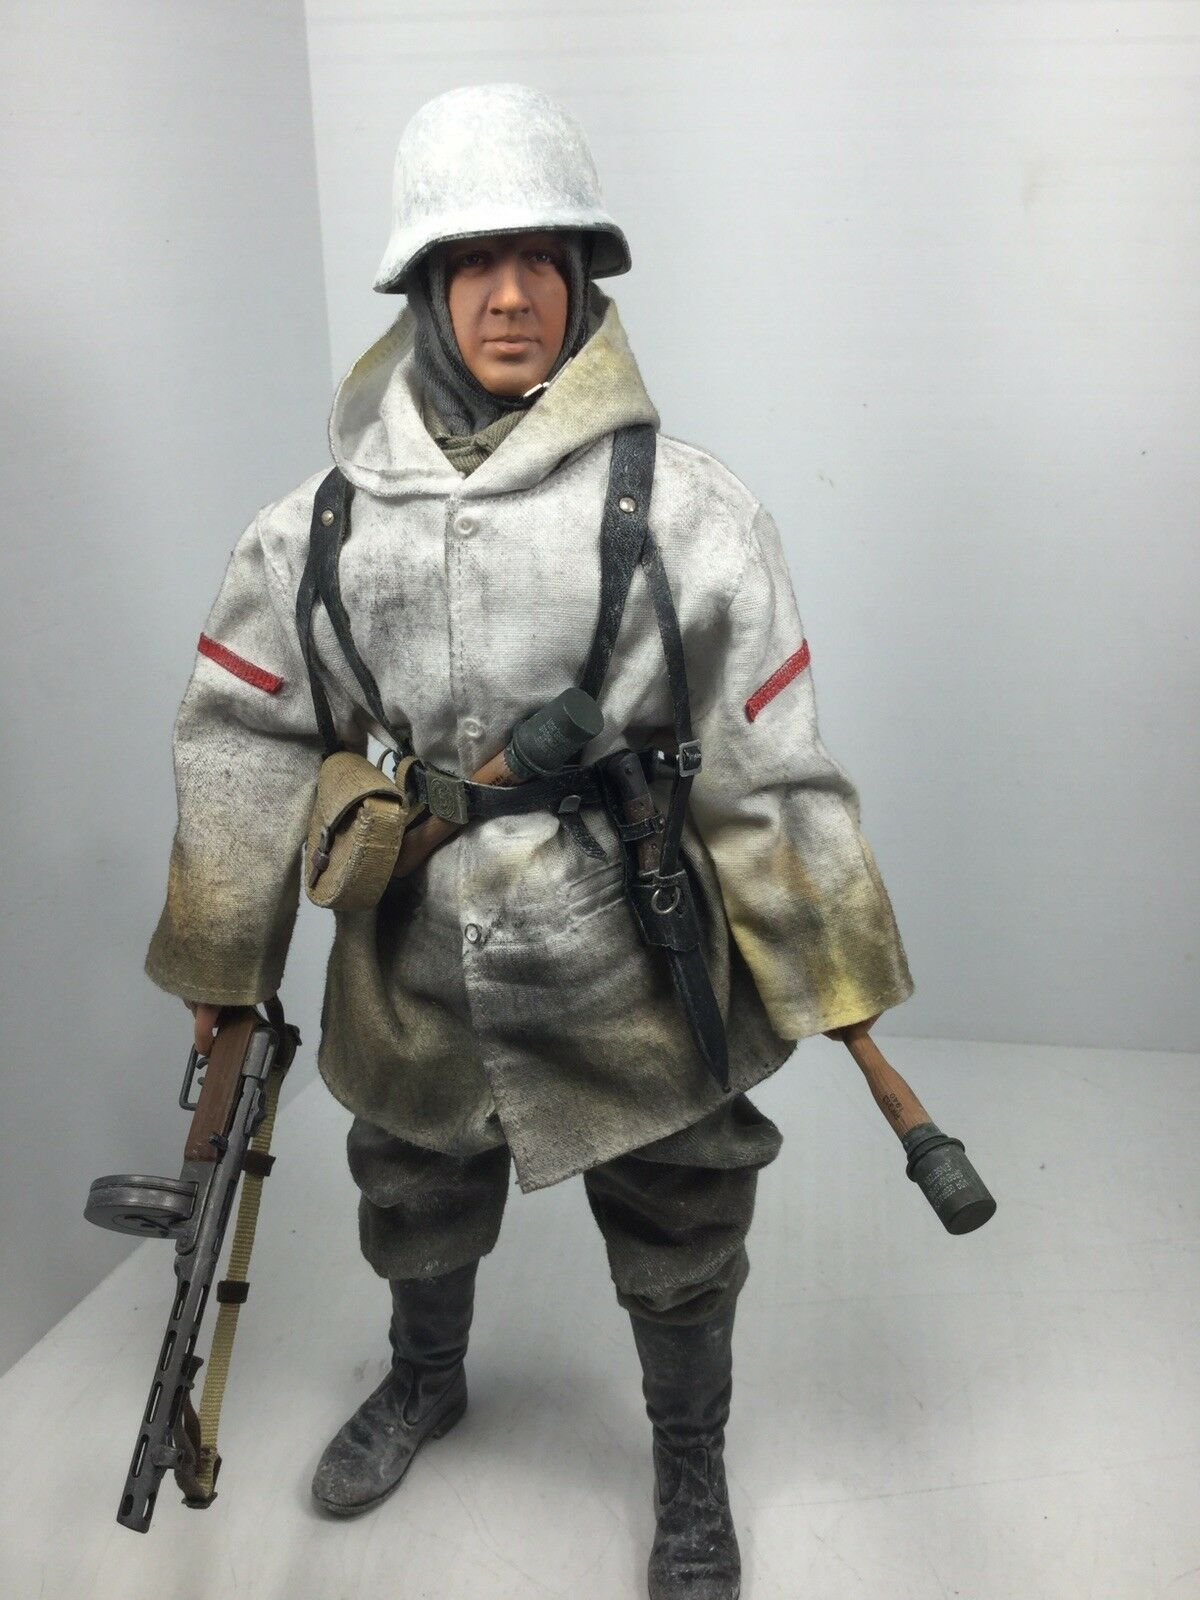 1 6 DRAGON GERMAN WEHRMACHT 6TH ARMY INFANTRY STALINGRAD PPSH-41 WW2 DID BBI 21